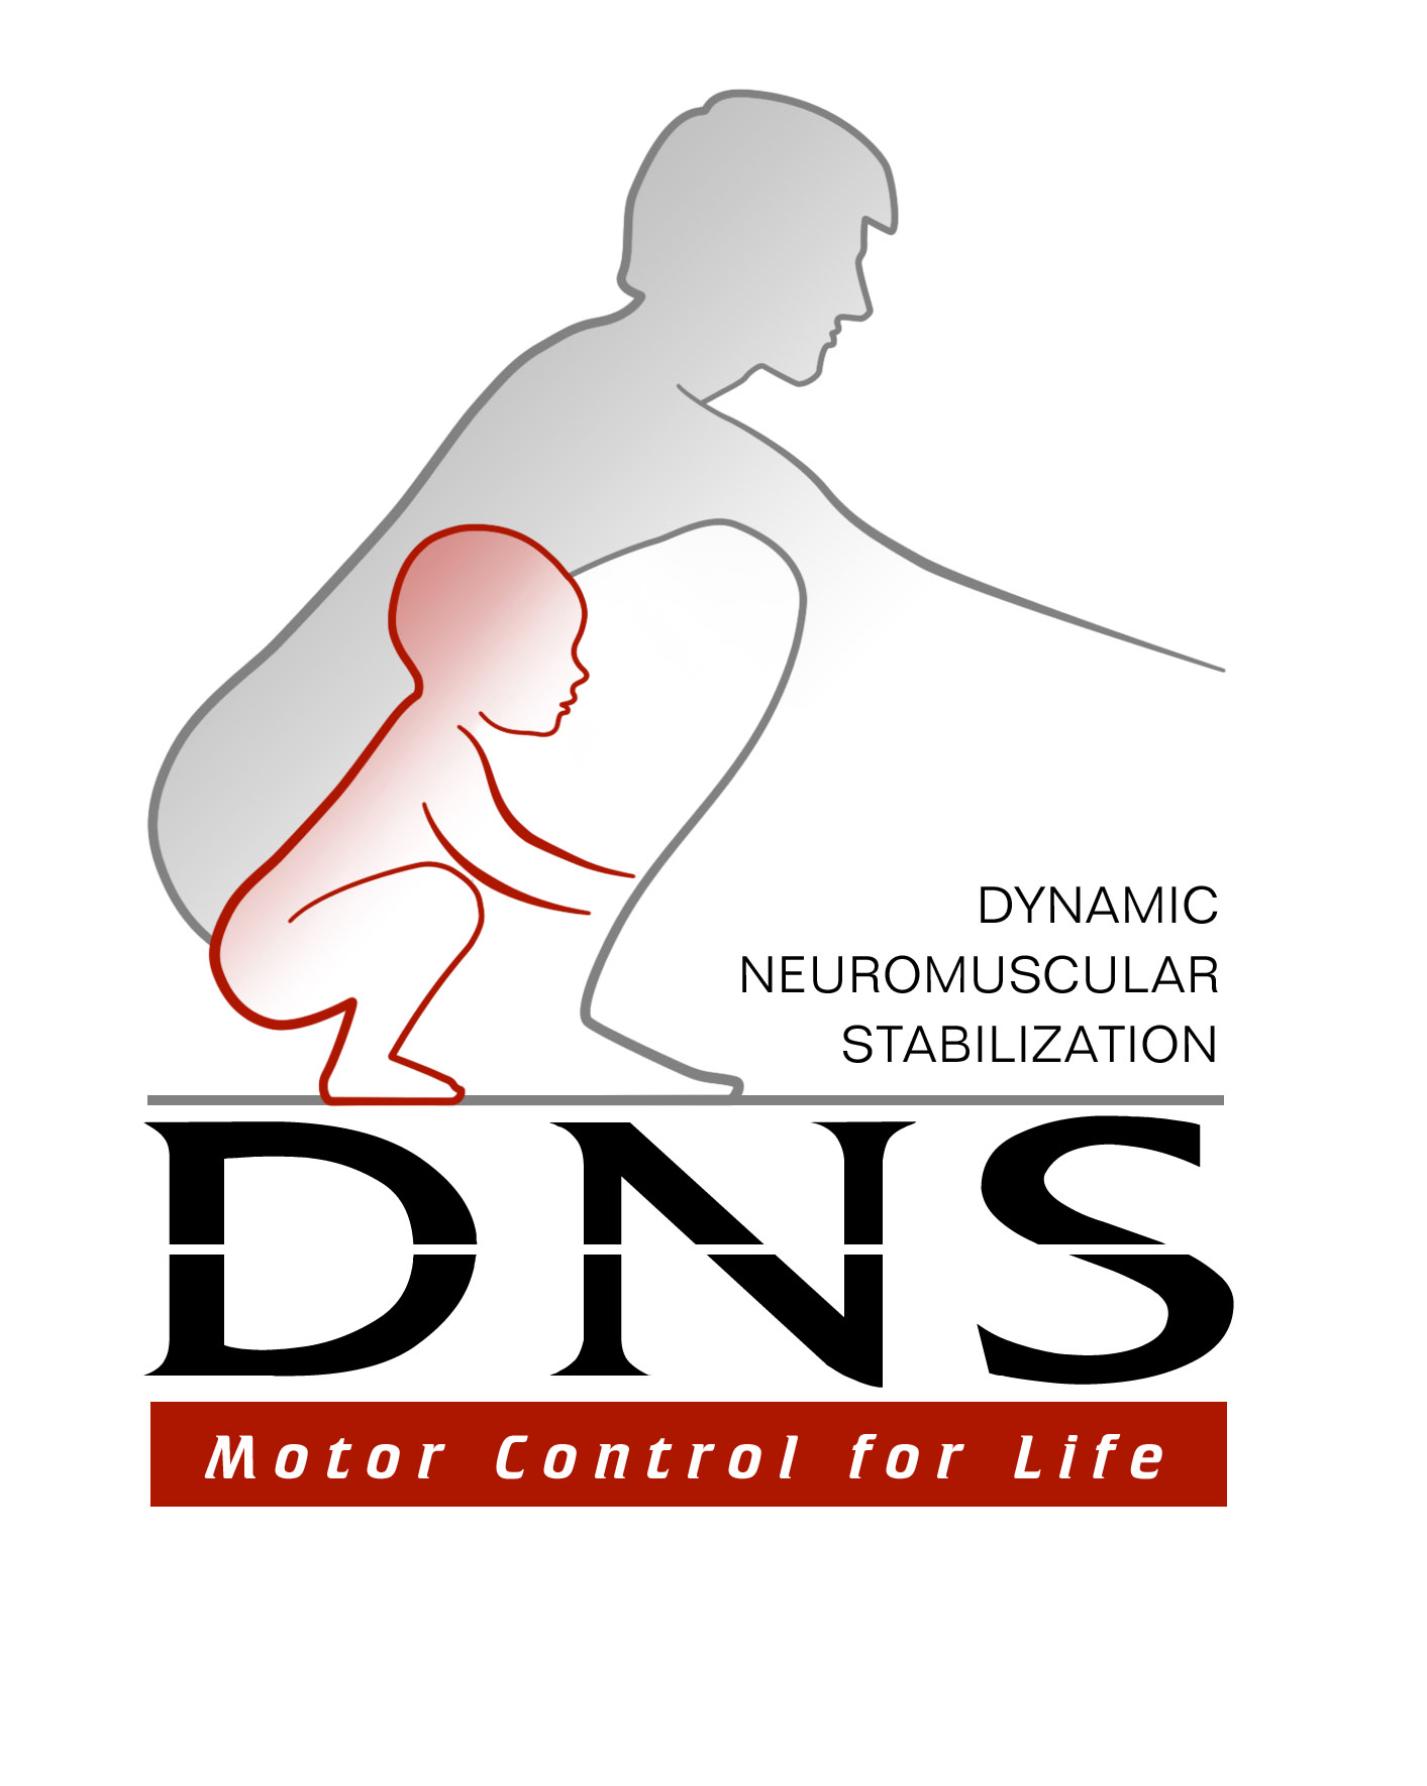 Dynamic Neuromuscular Stabilization